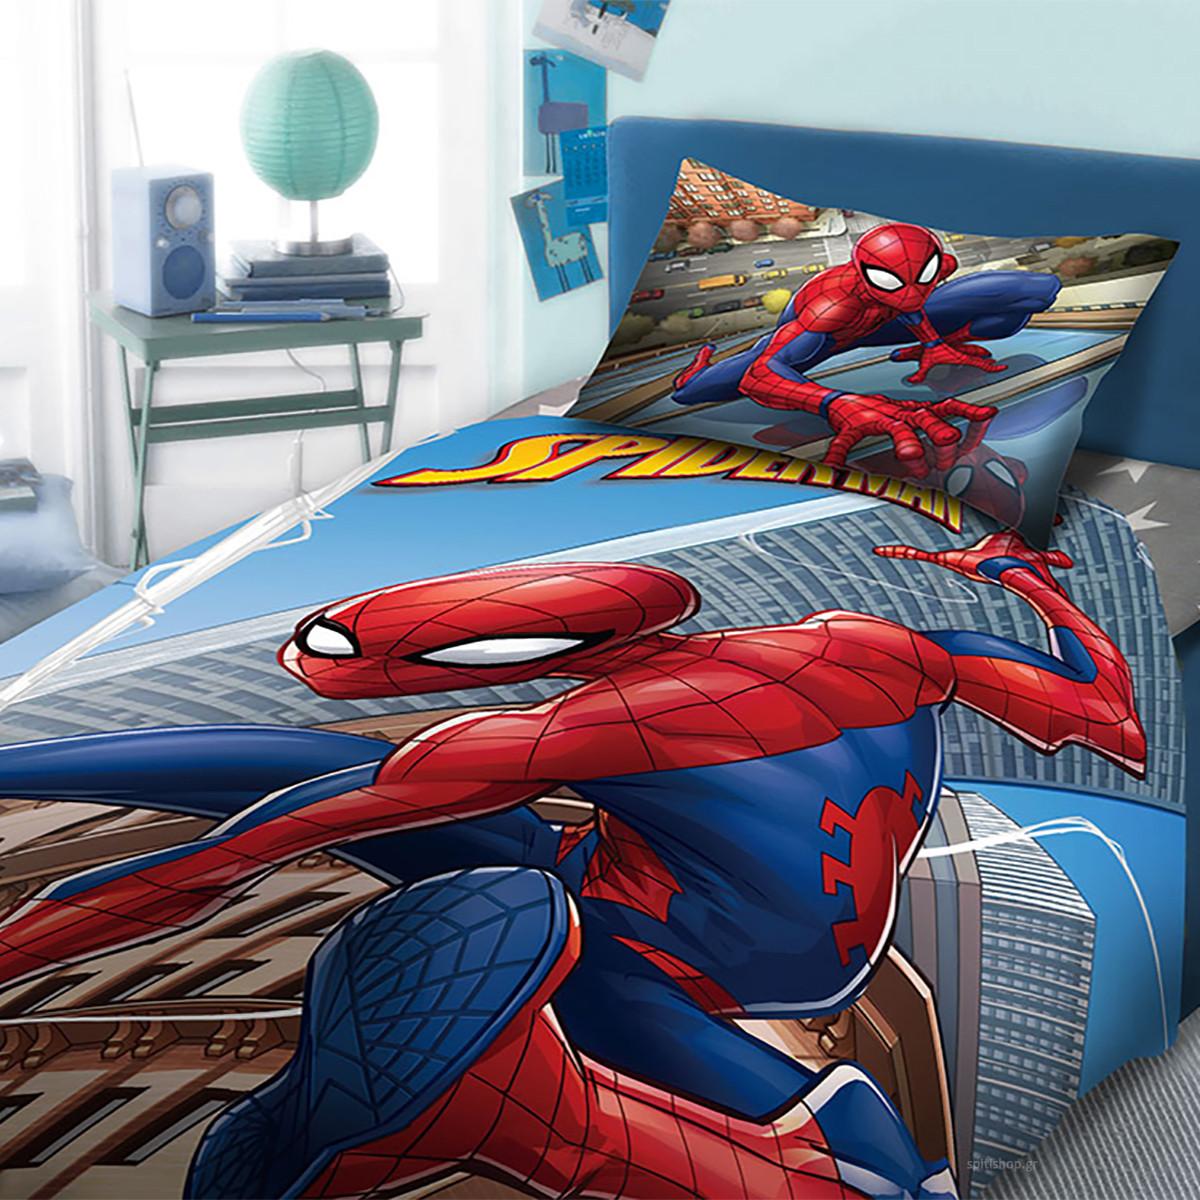 d60c502fefe -10% Spiti Shop Σεντόνια Μονά (Σετ 3τμχ) Dim Collection Spiderman 913